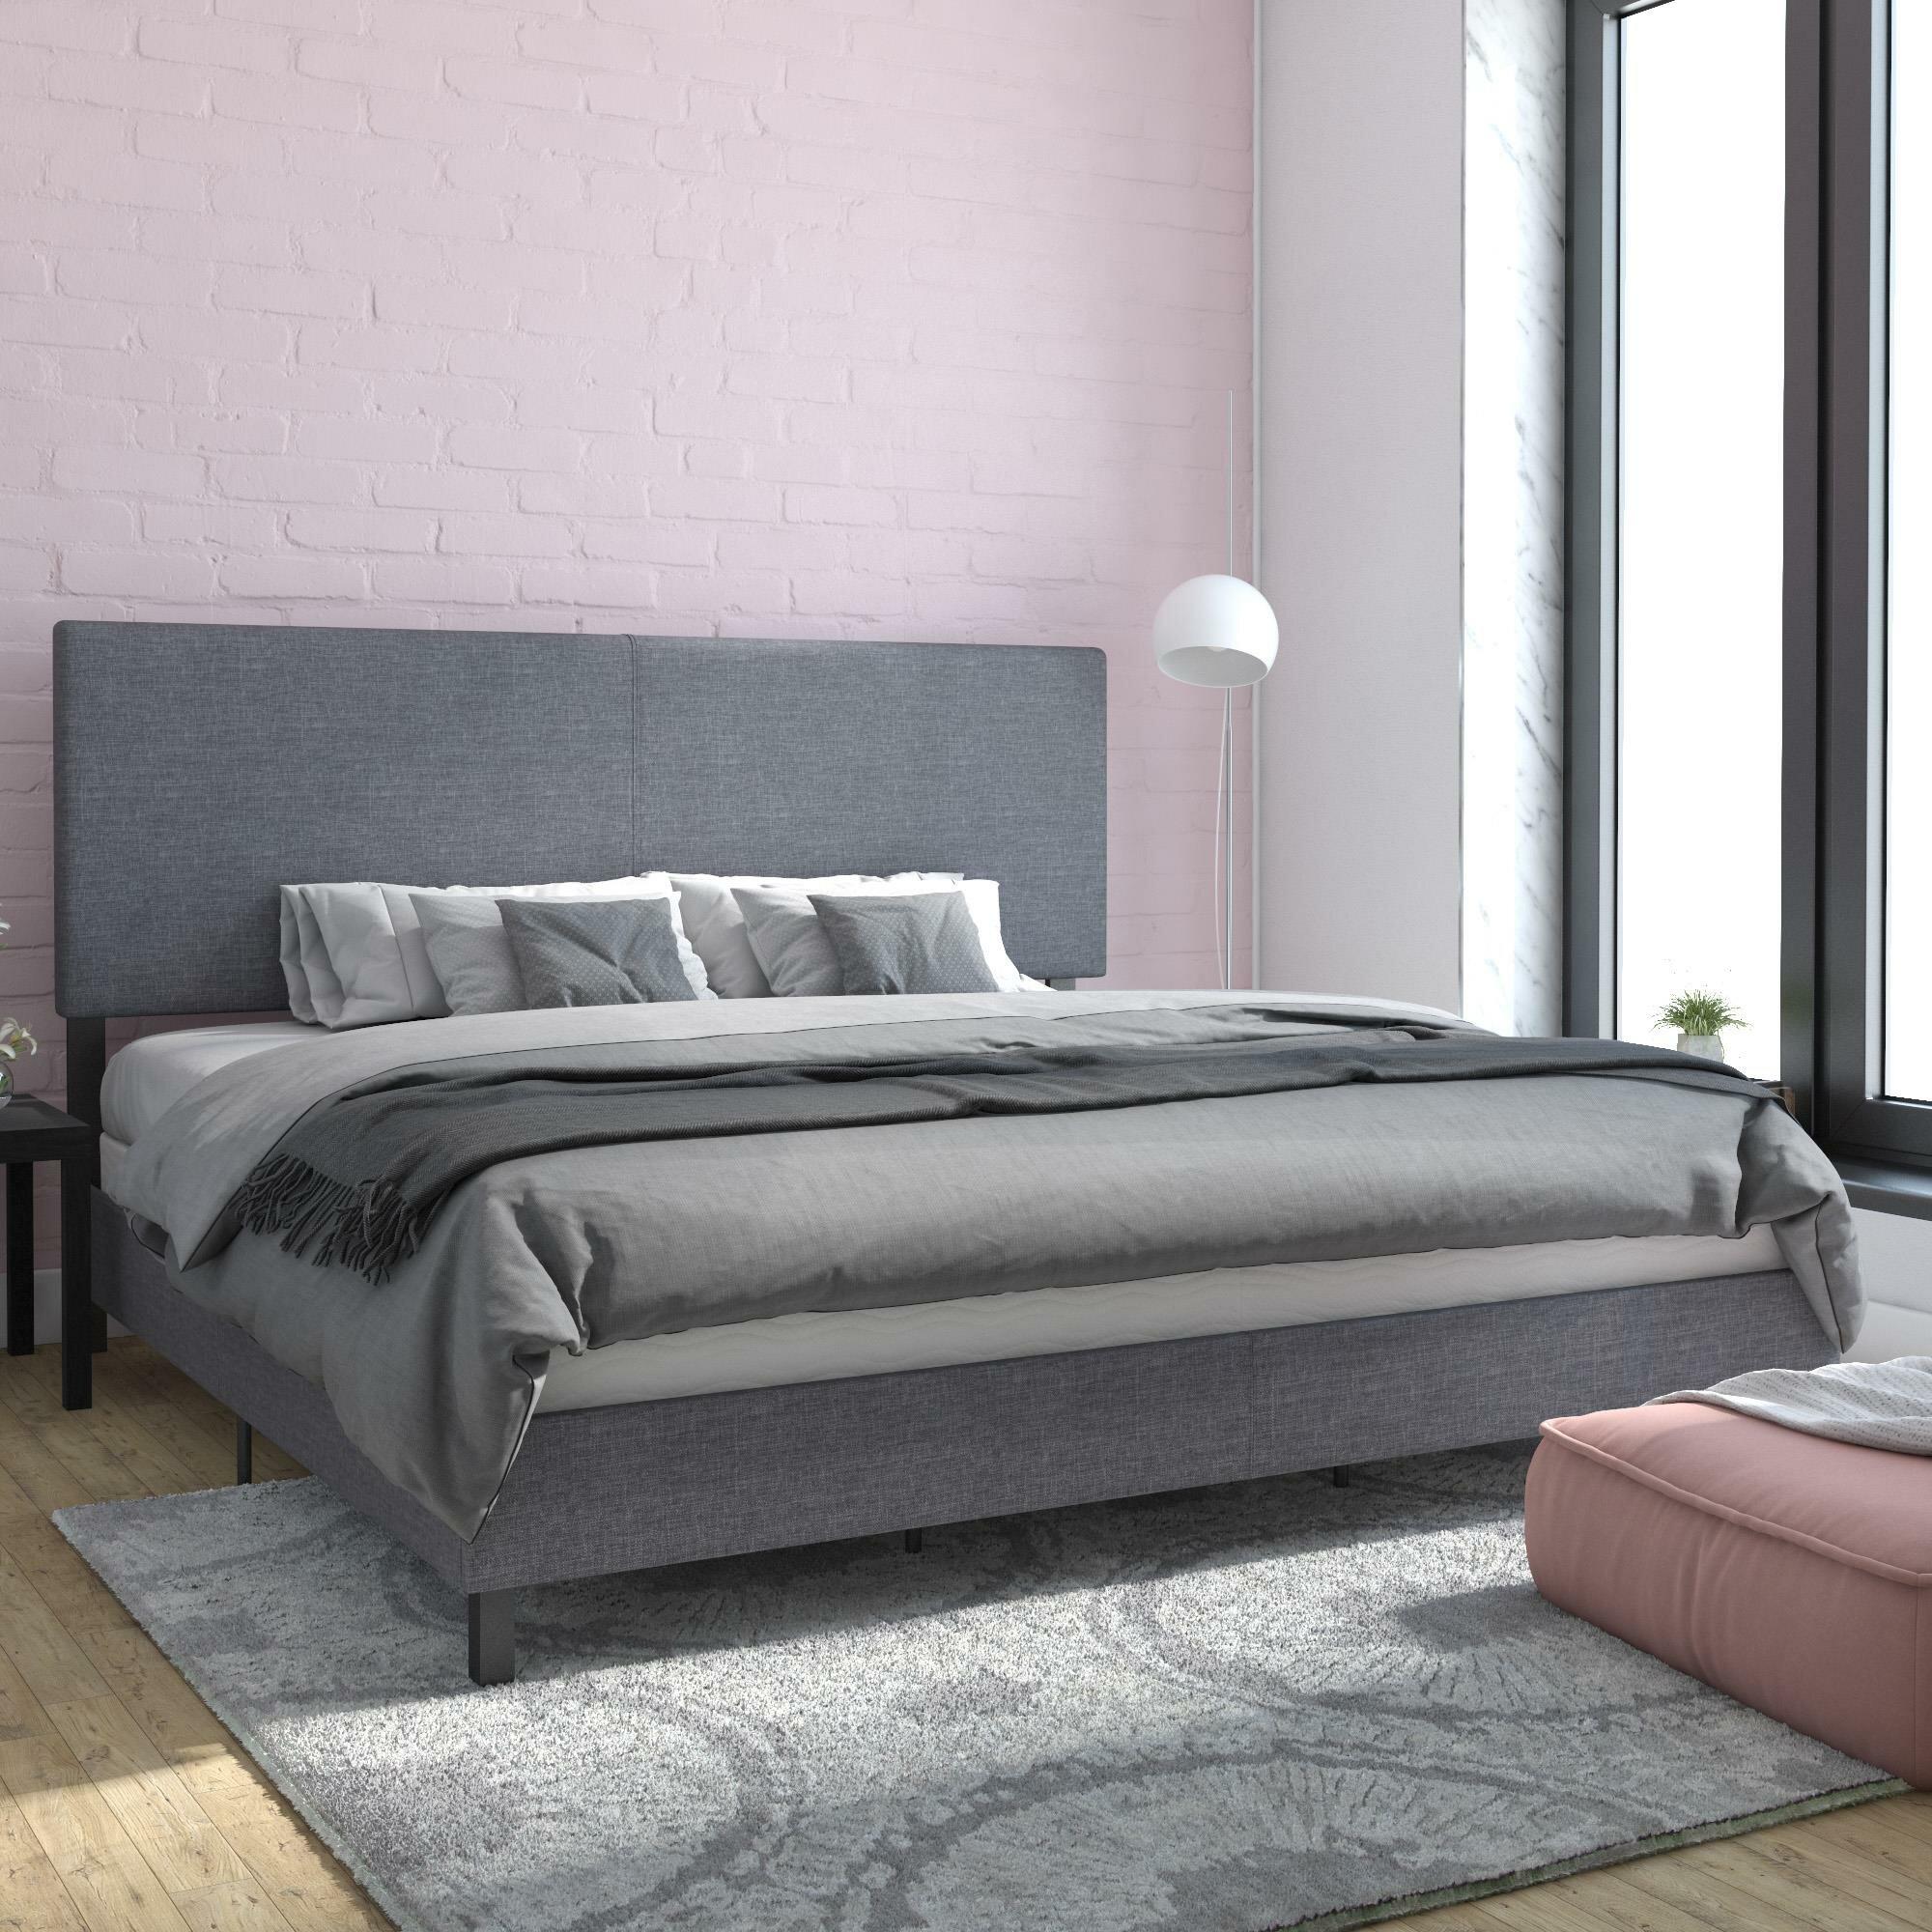 Modern King Beds Free Shipping Over 35 Wayfair